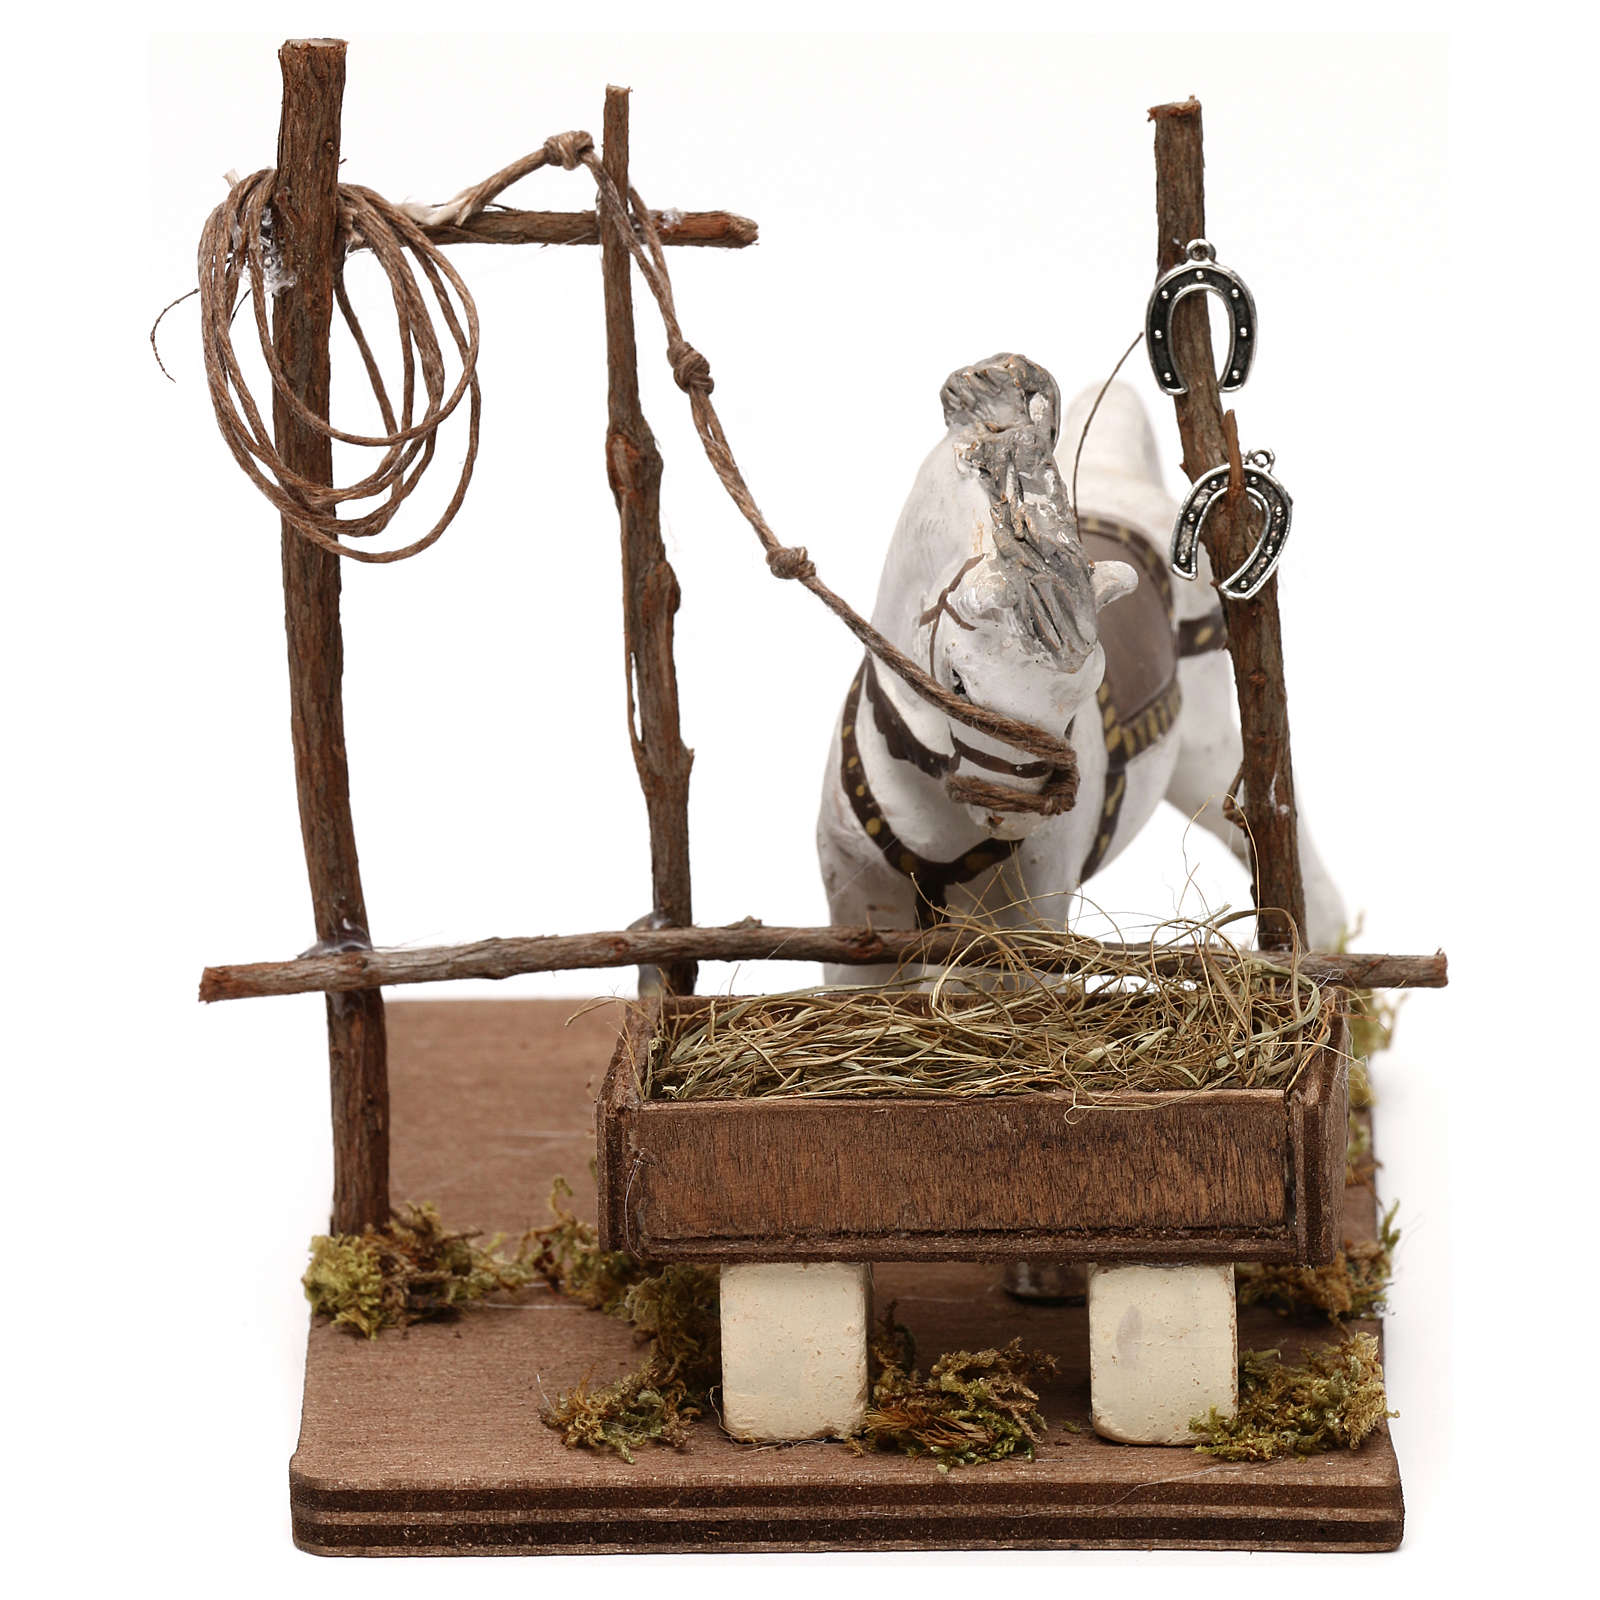 Horse with trough, Neapolitan Nativity scene 10 cm 4